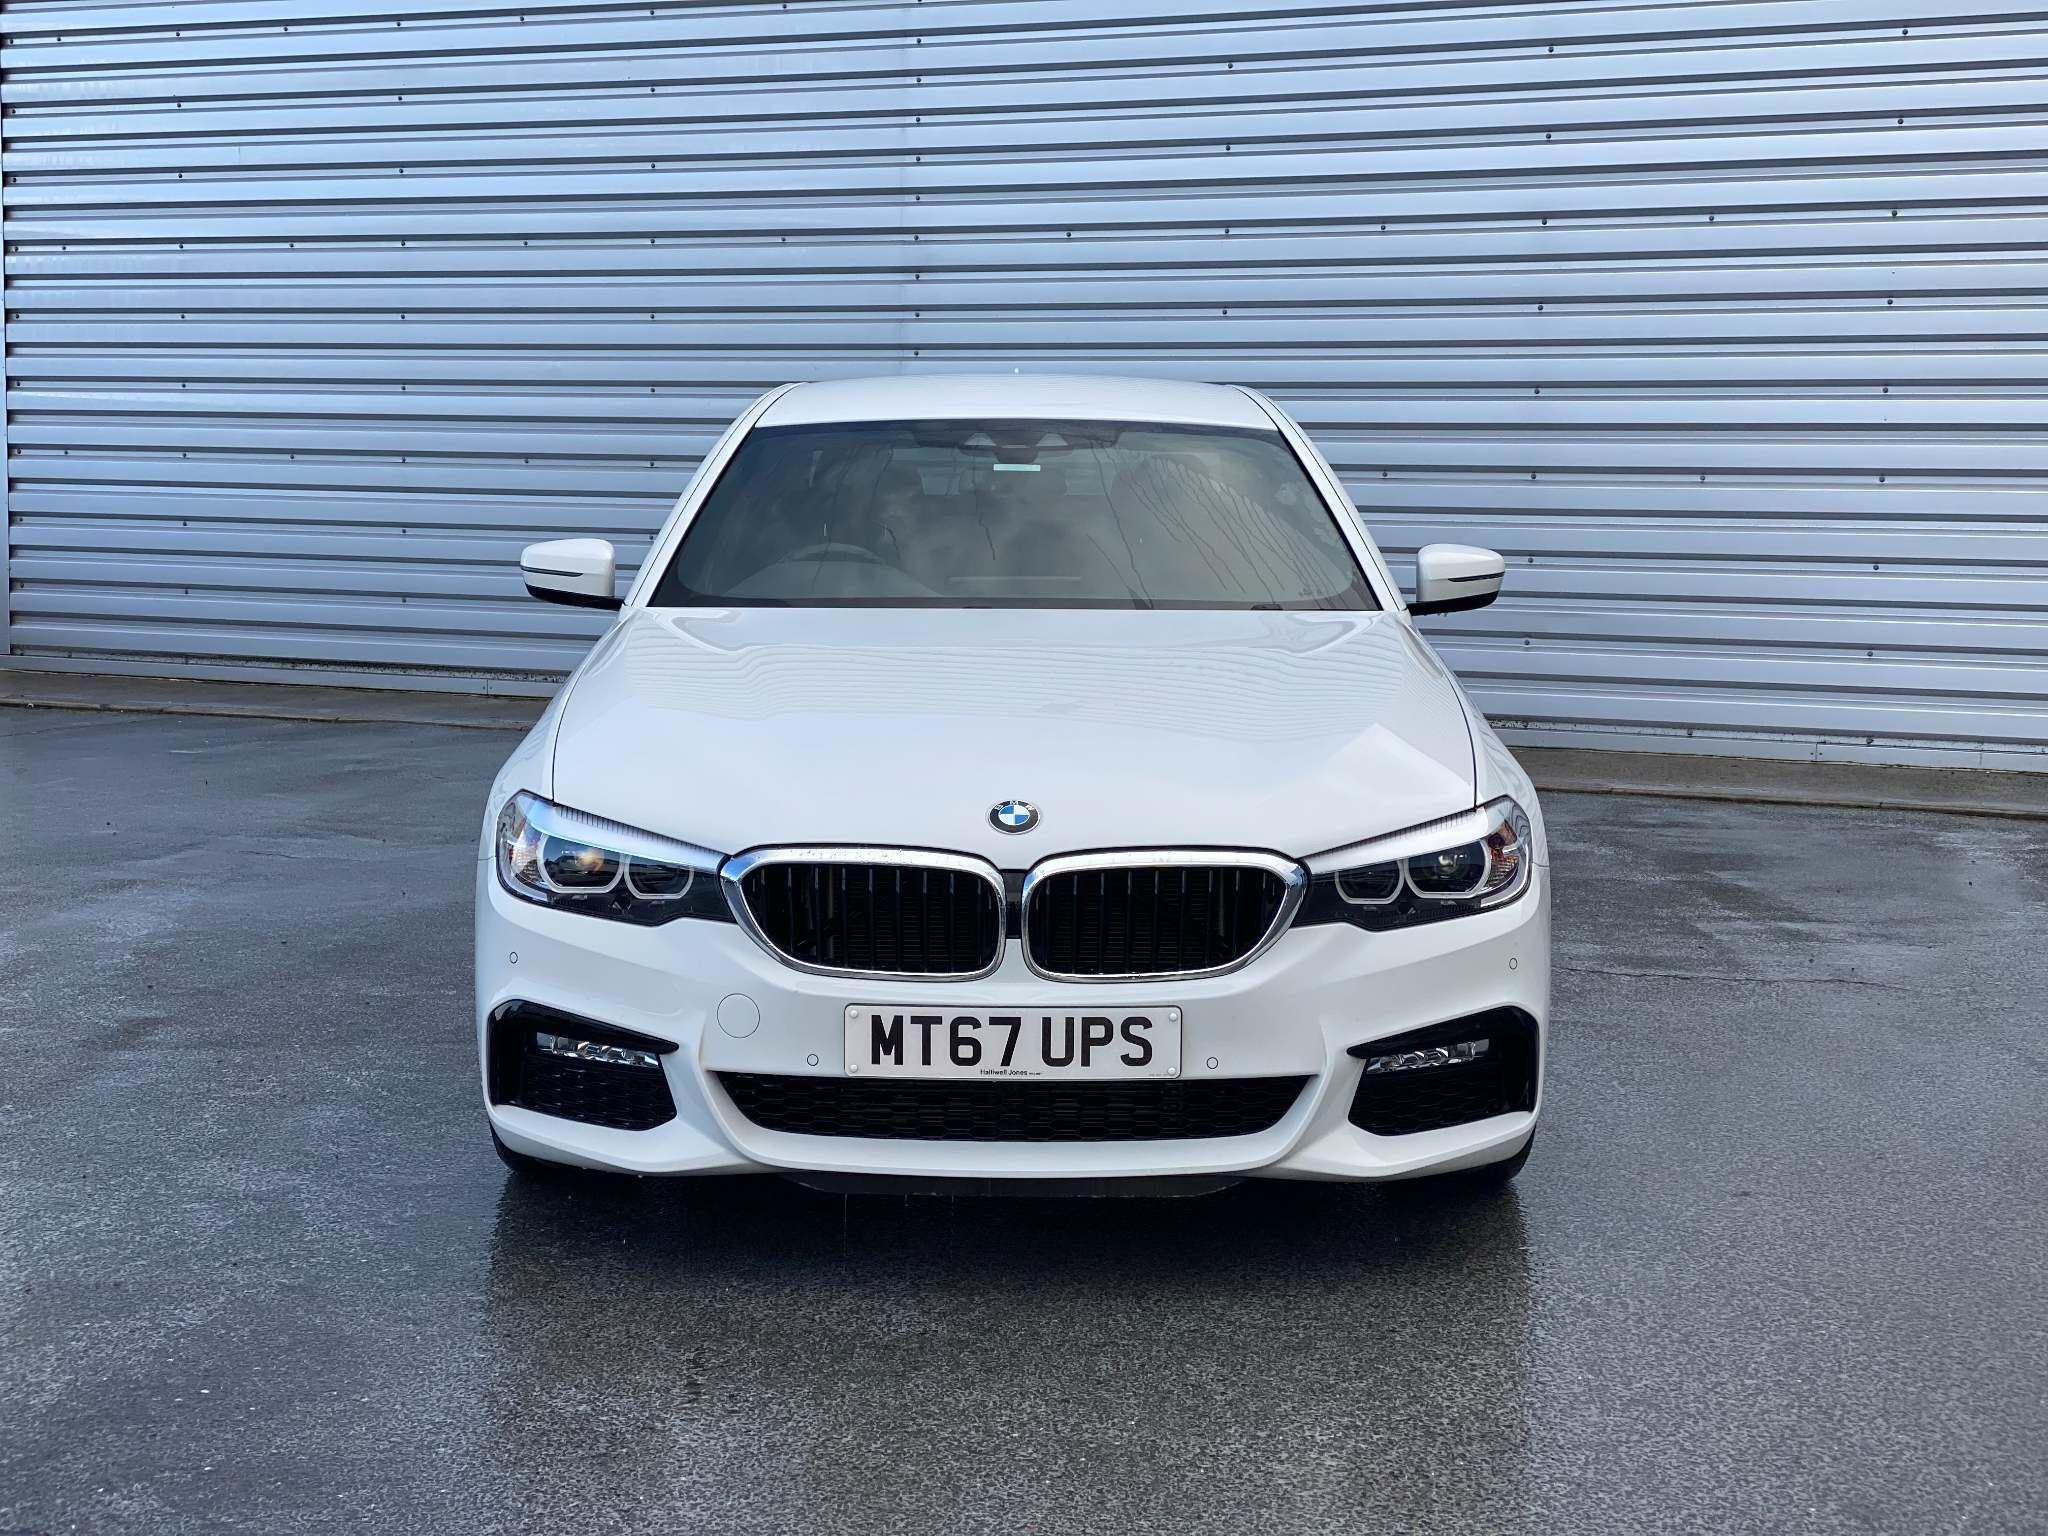 Image 4 - BMW 520d M Sport Saloon (MT67UPS)